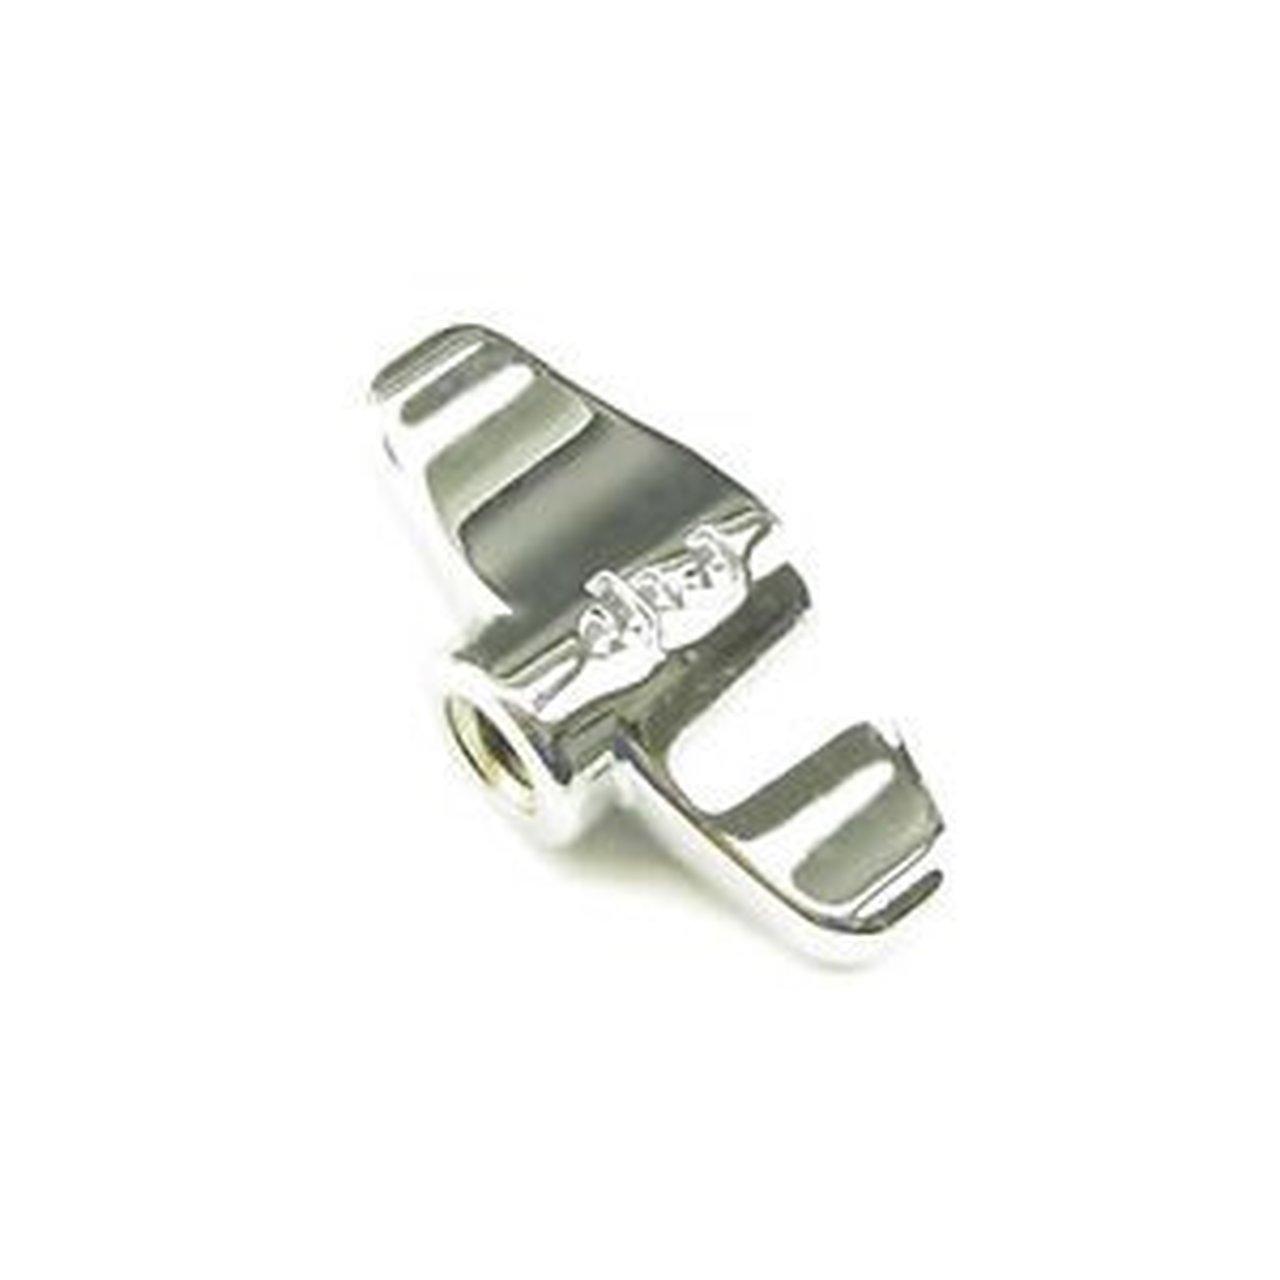 DW SM2238 siipimutteri, 8mm